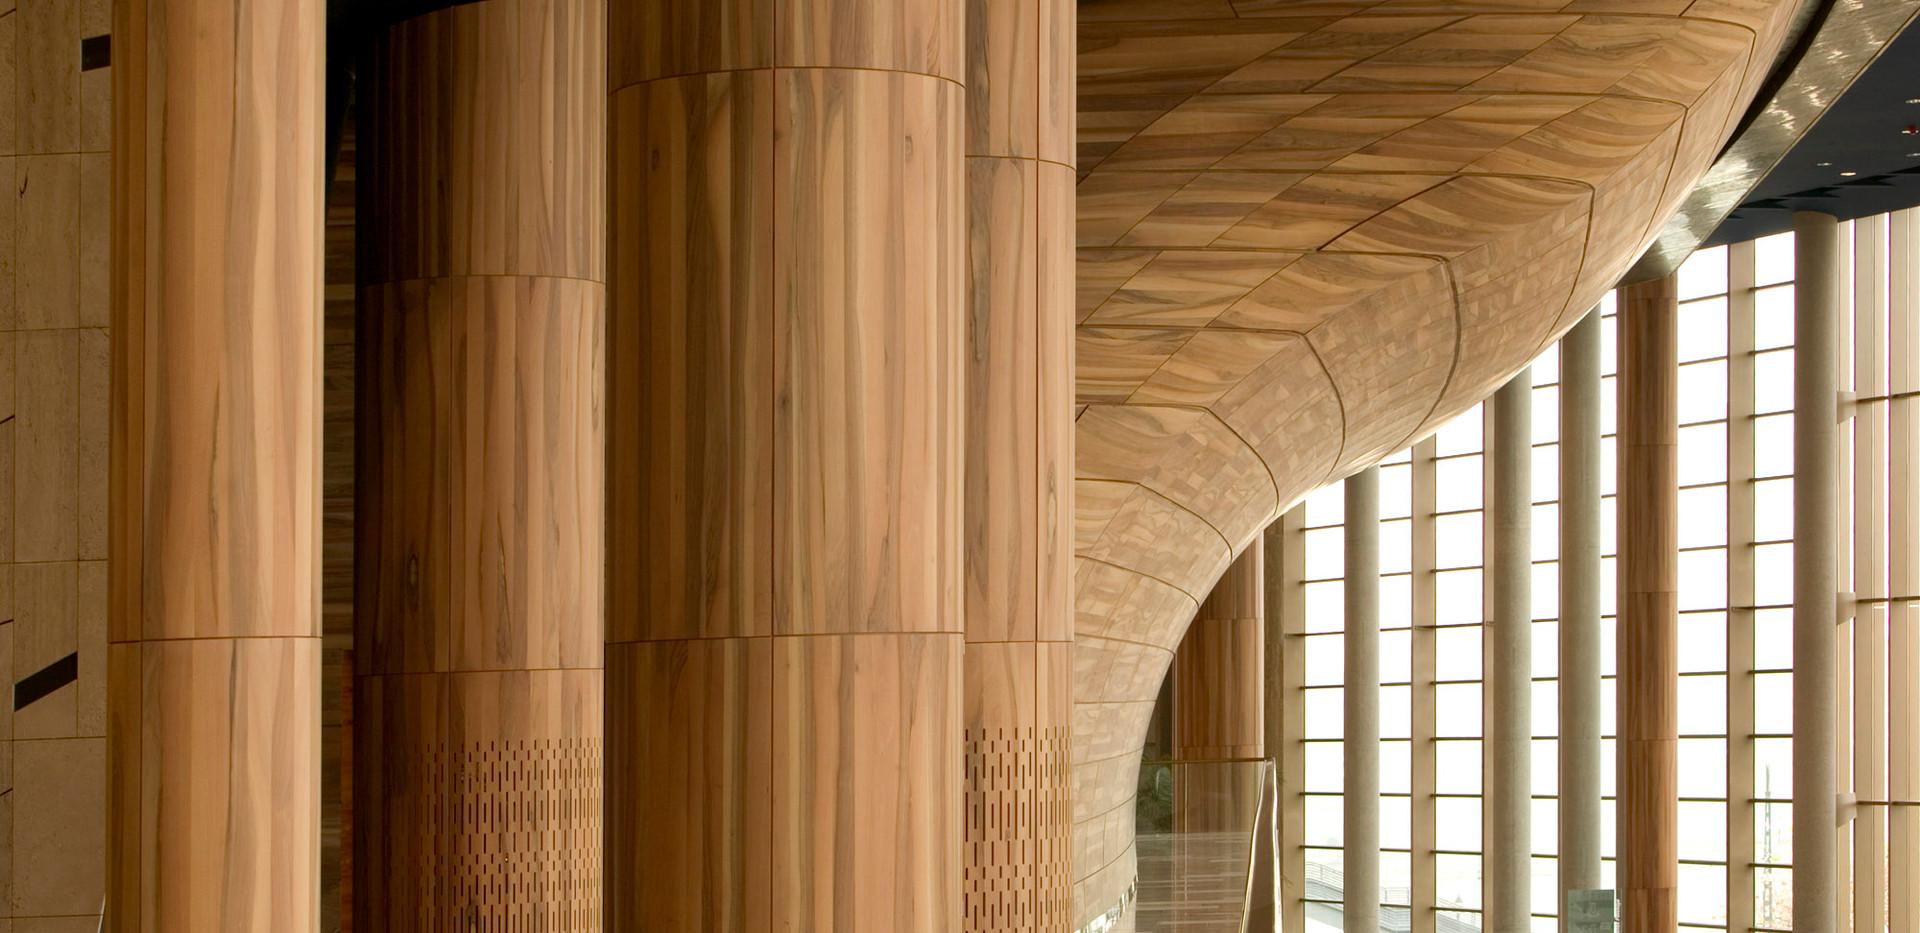 MUPA-palace-of-arts-Demeter-Design-Studi